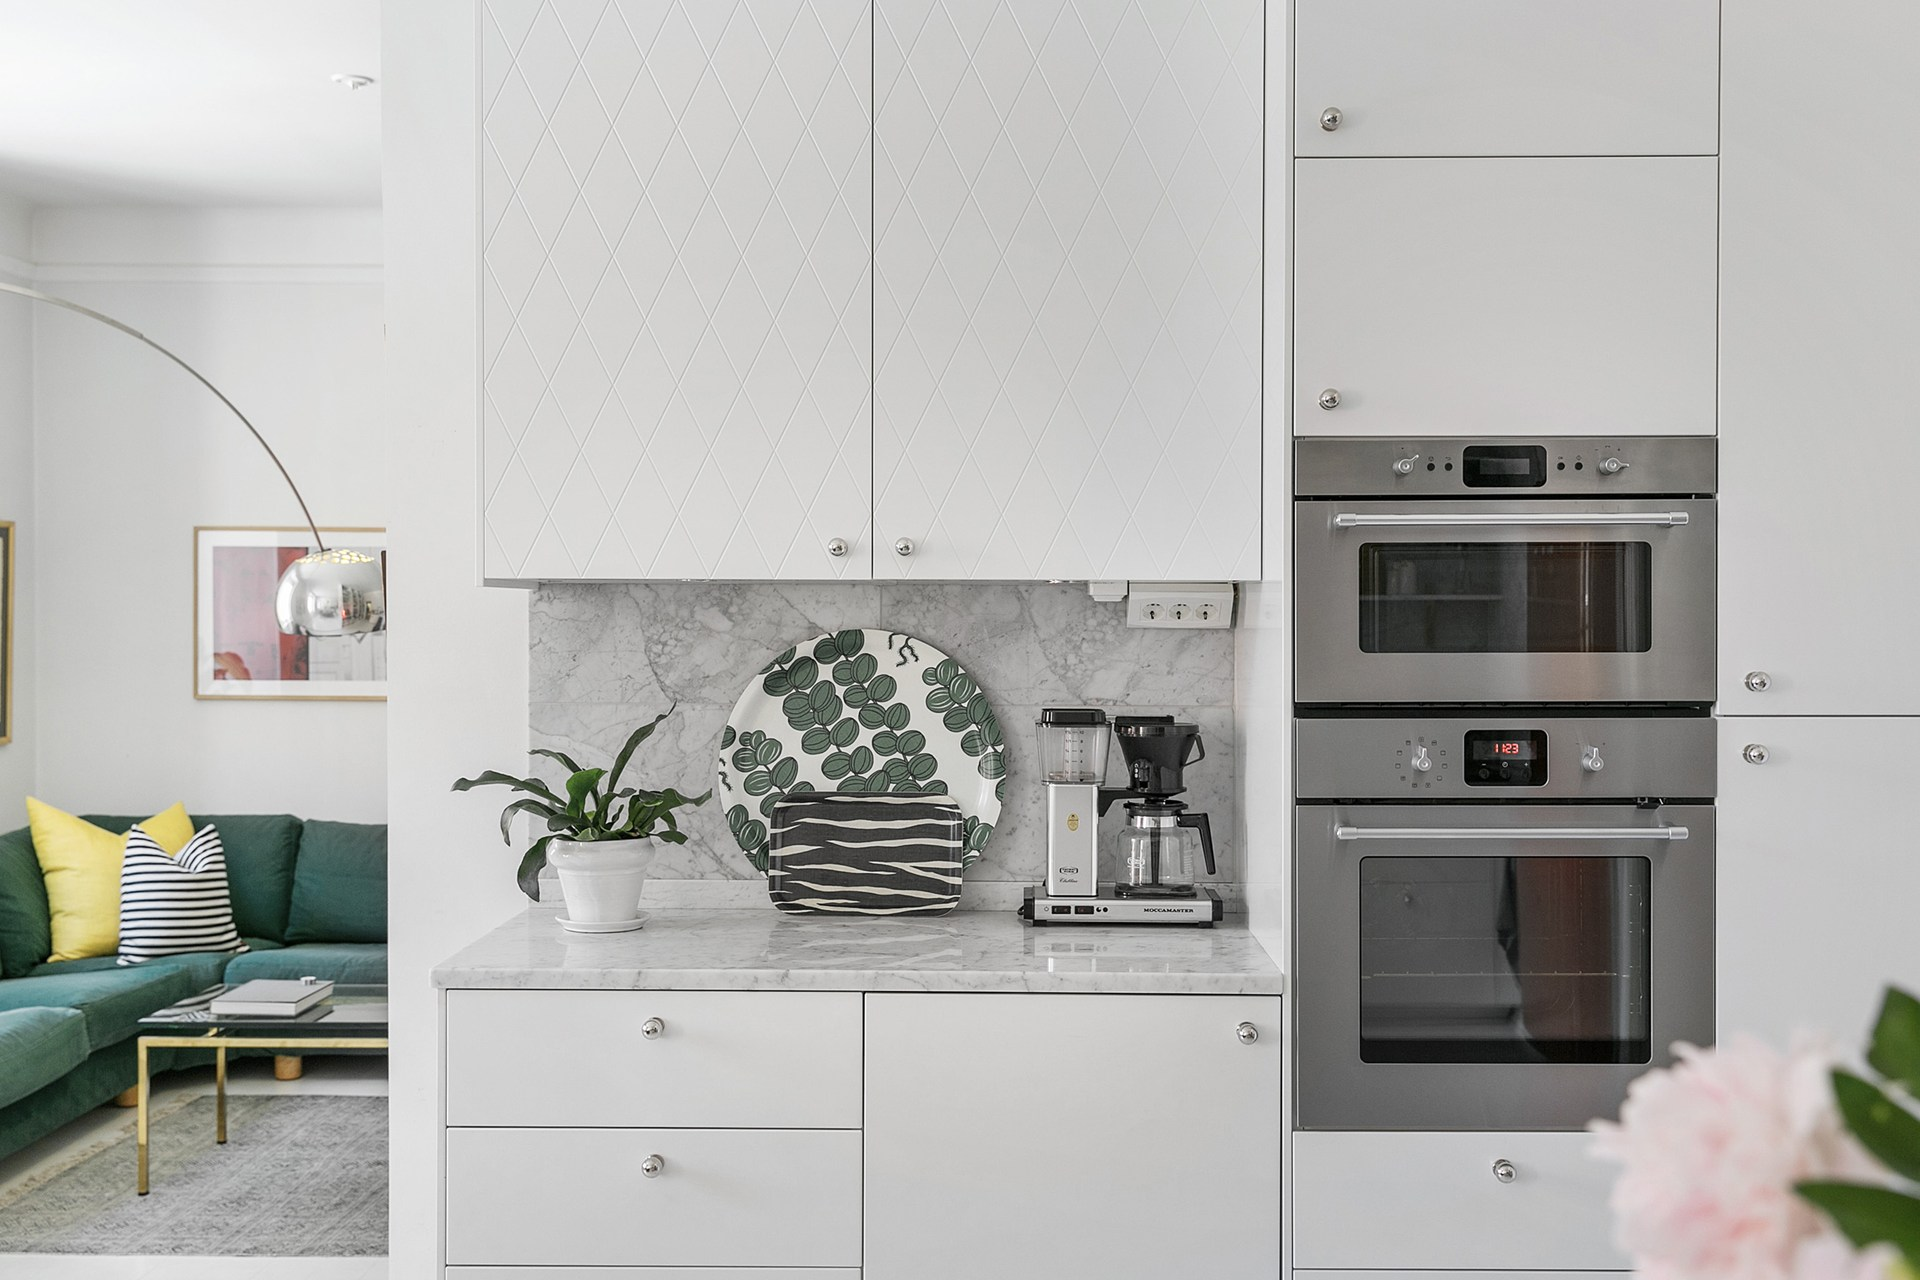 кухня встроенная техника столешница фартук мрамор